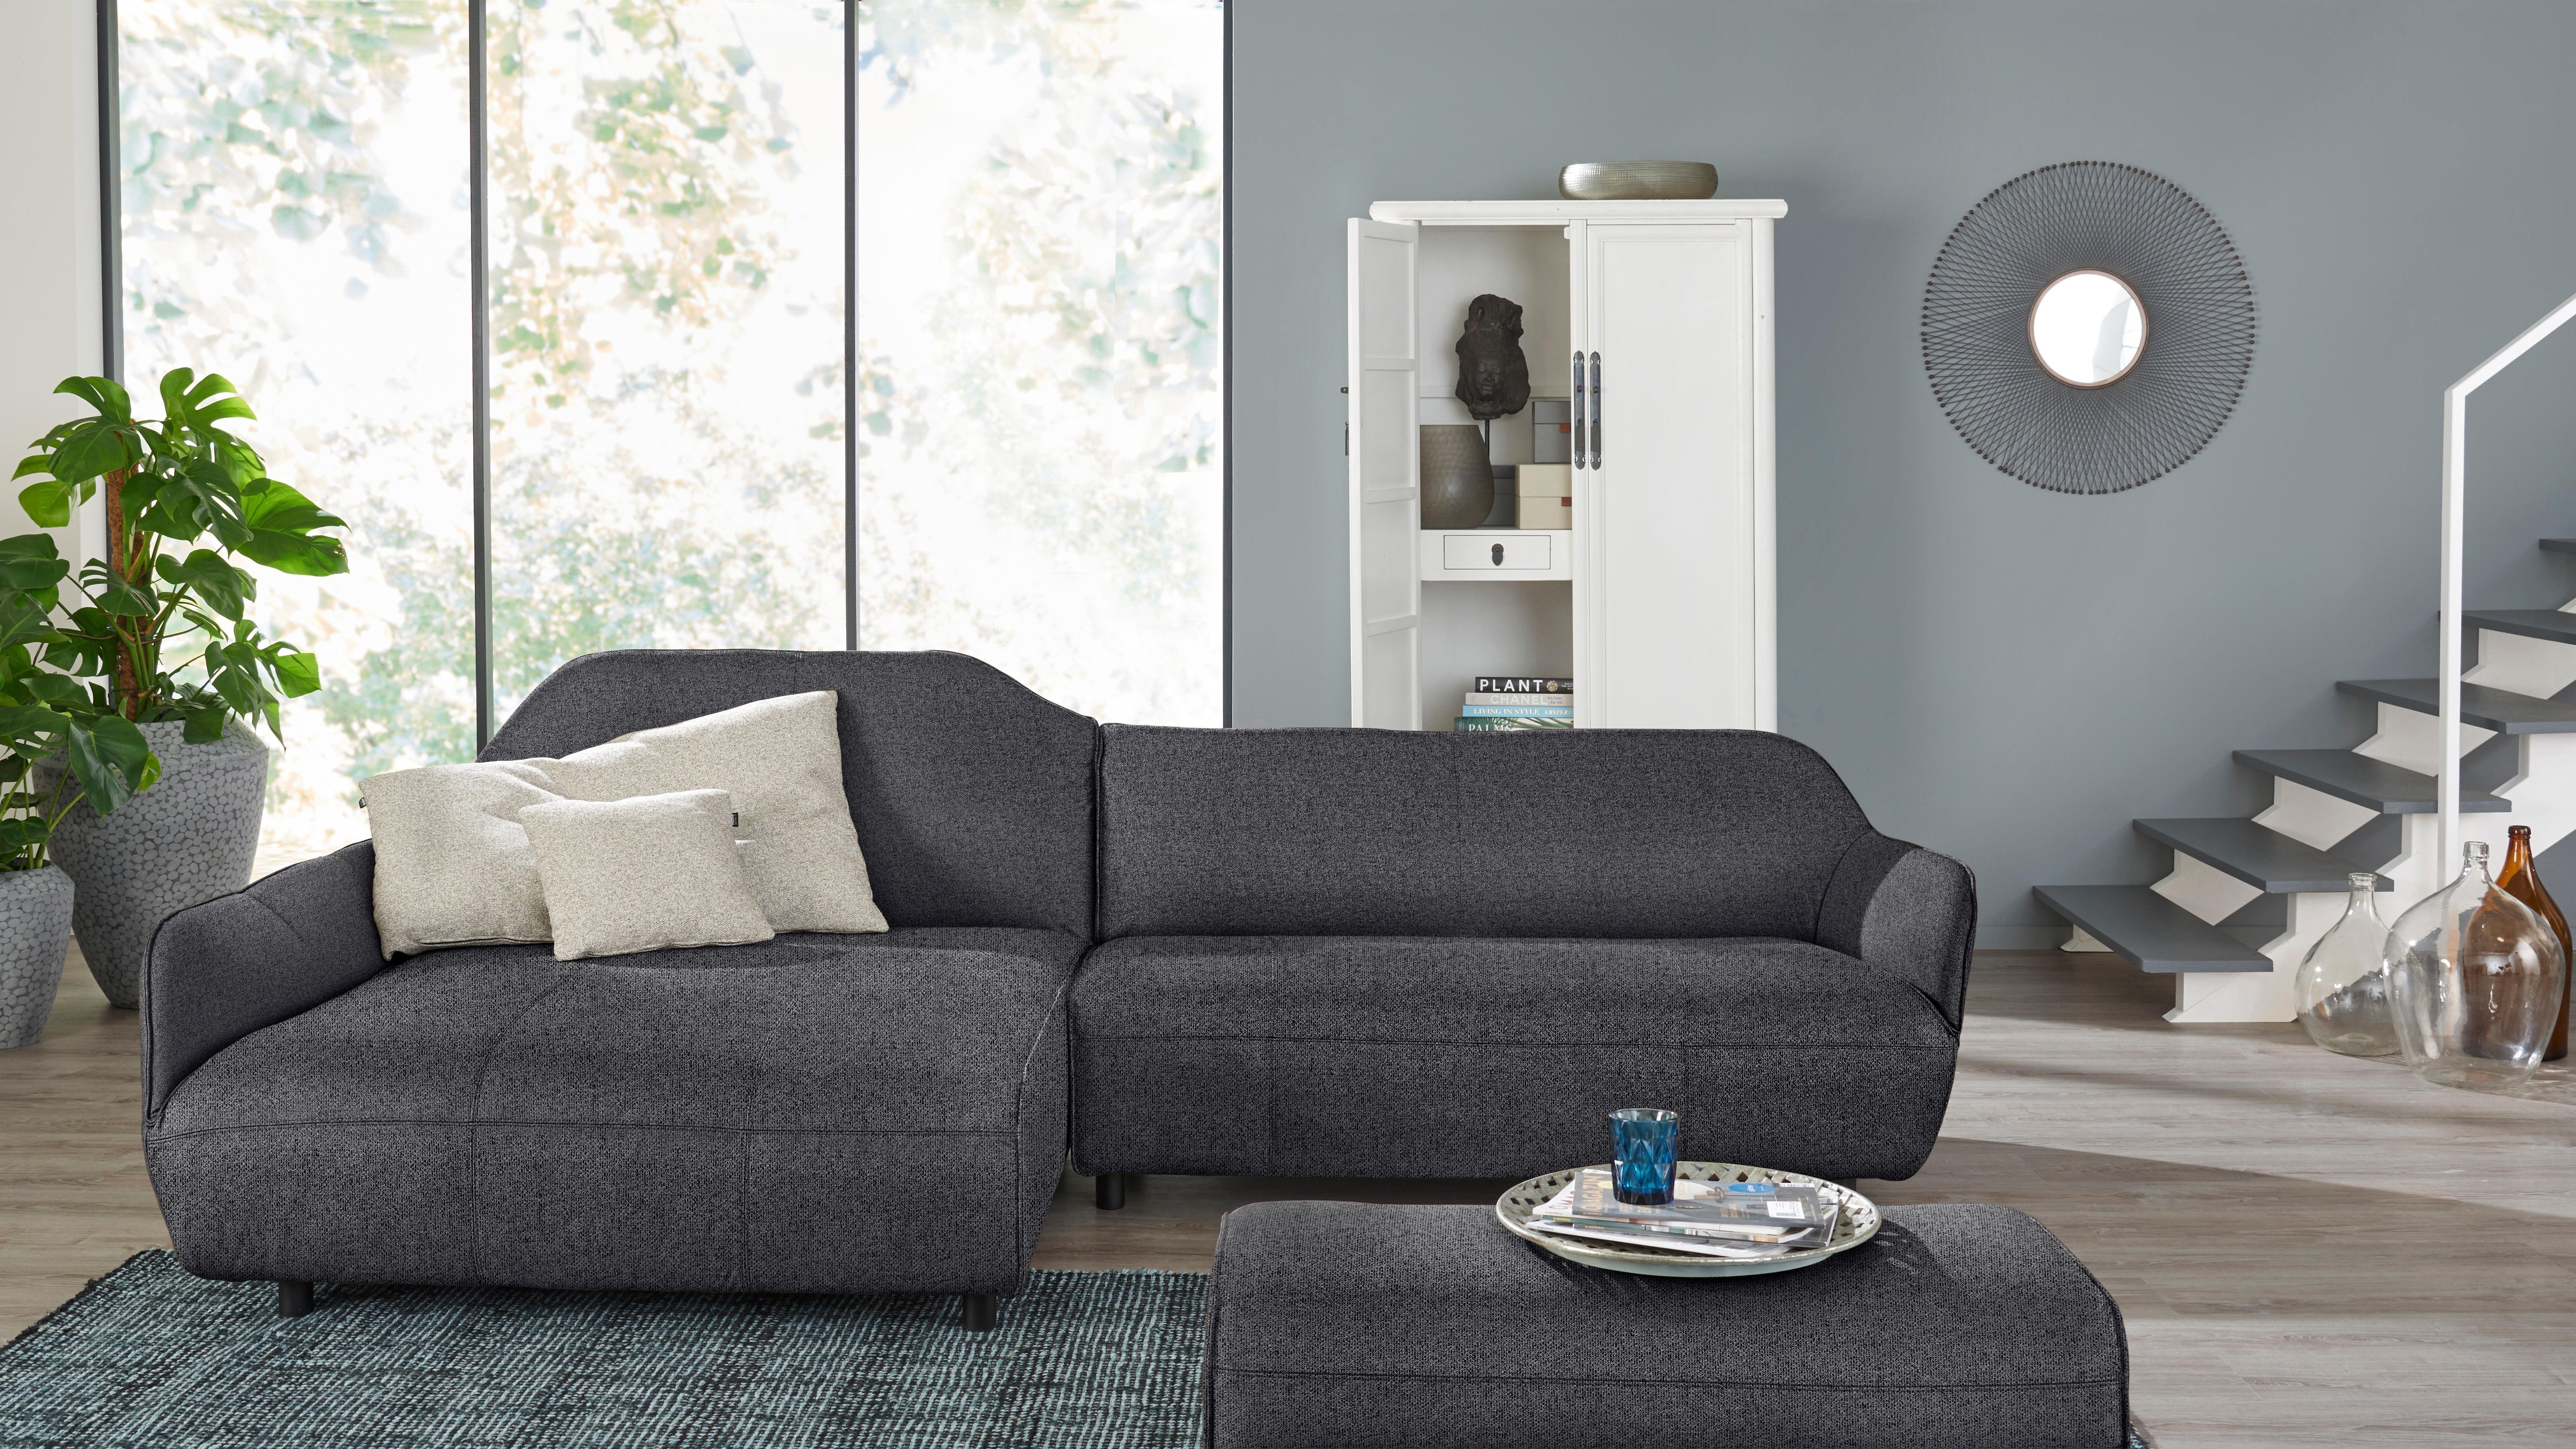 Hülsta Sofa Ecksofa »hs.480«, Designsofa wahlweise in Stoff oder Leder